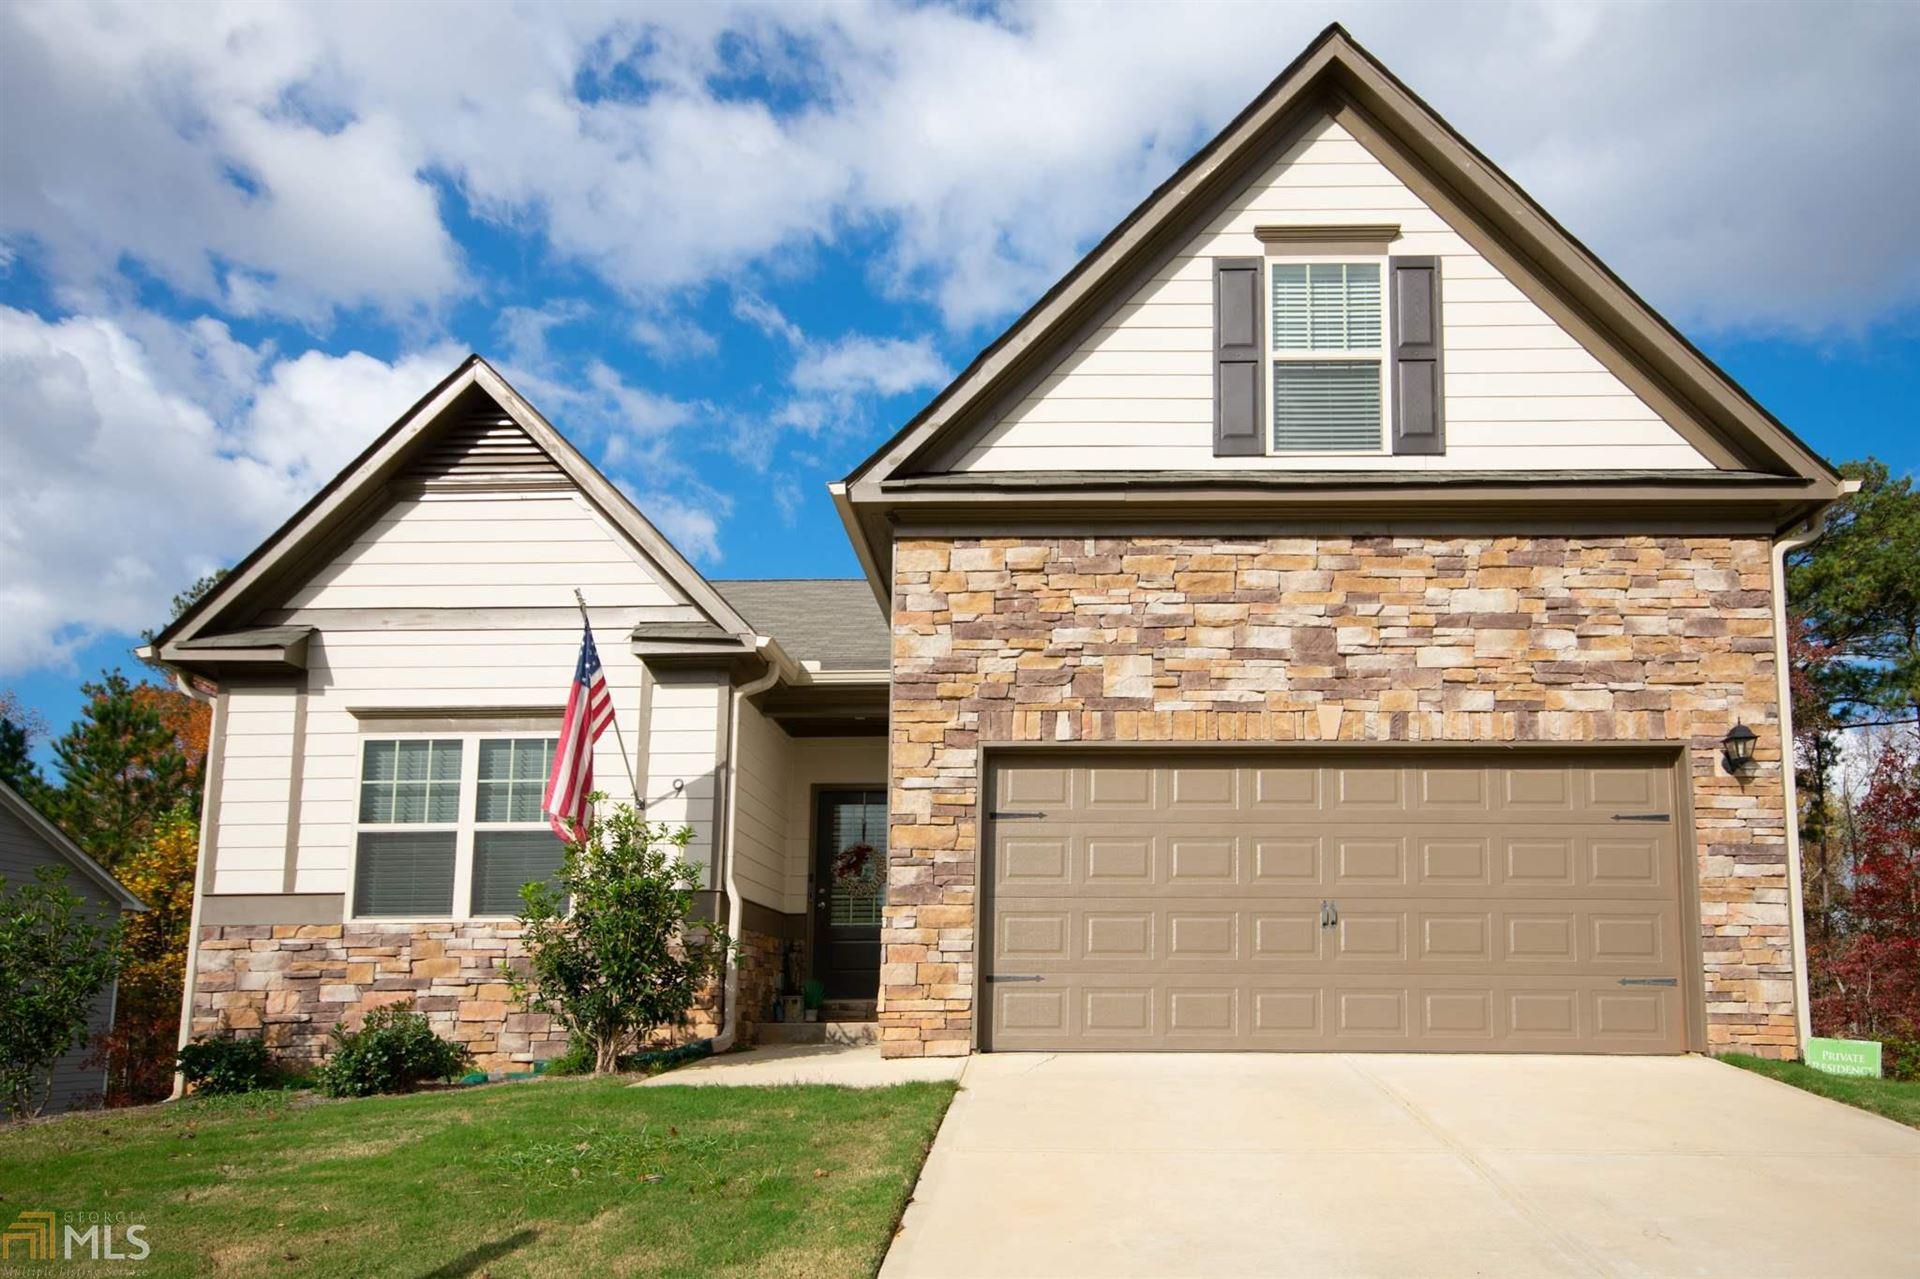 9 Carrington Way, Newnan, GA 30265 - MLS#: 8881485